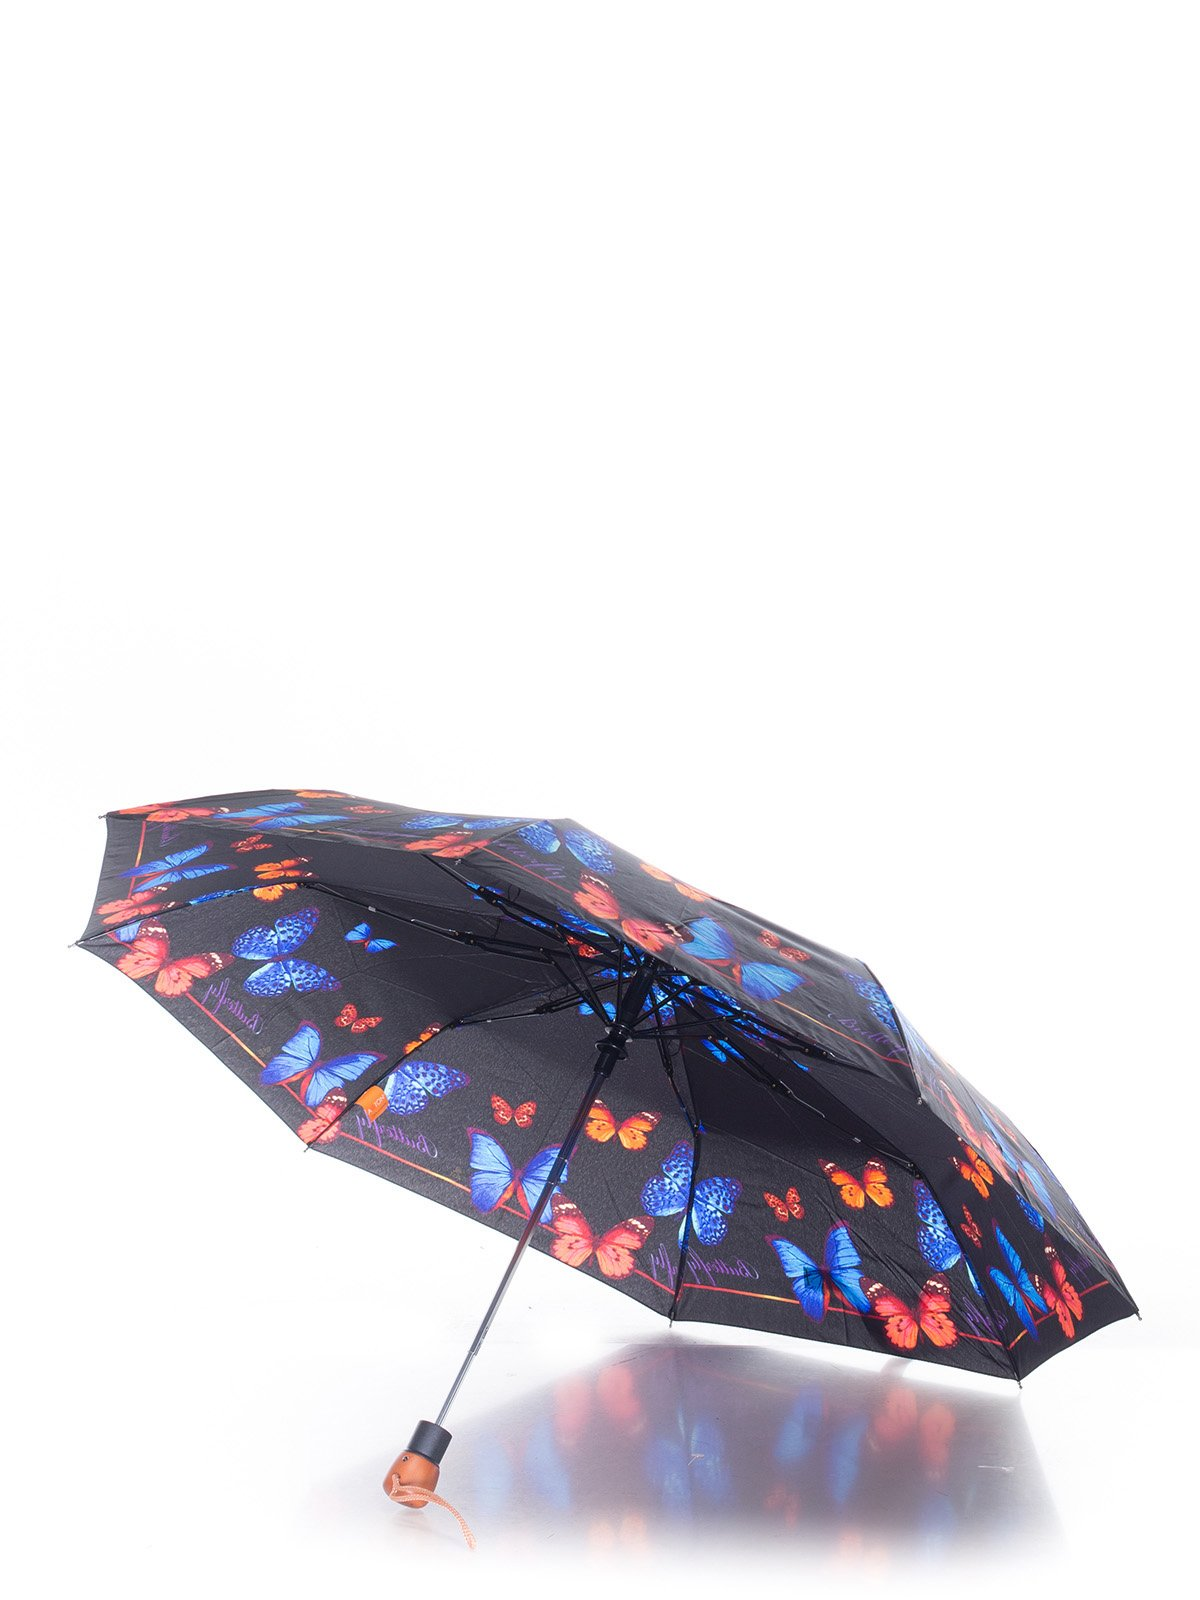 Зонт | 3296725 | фото 2